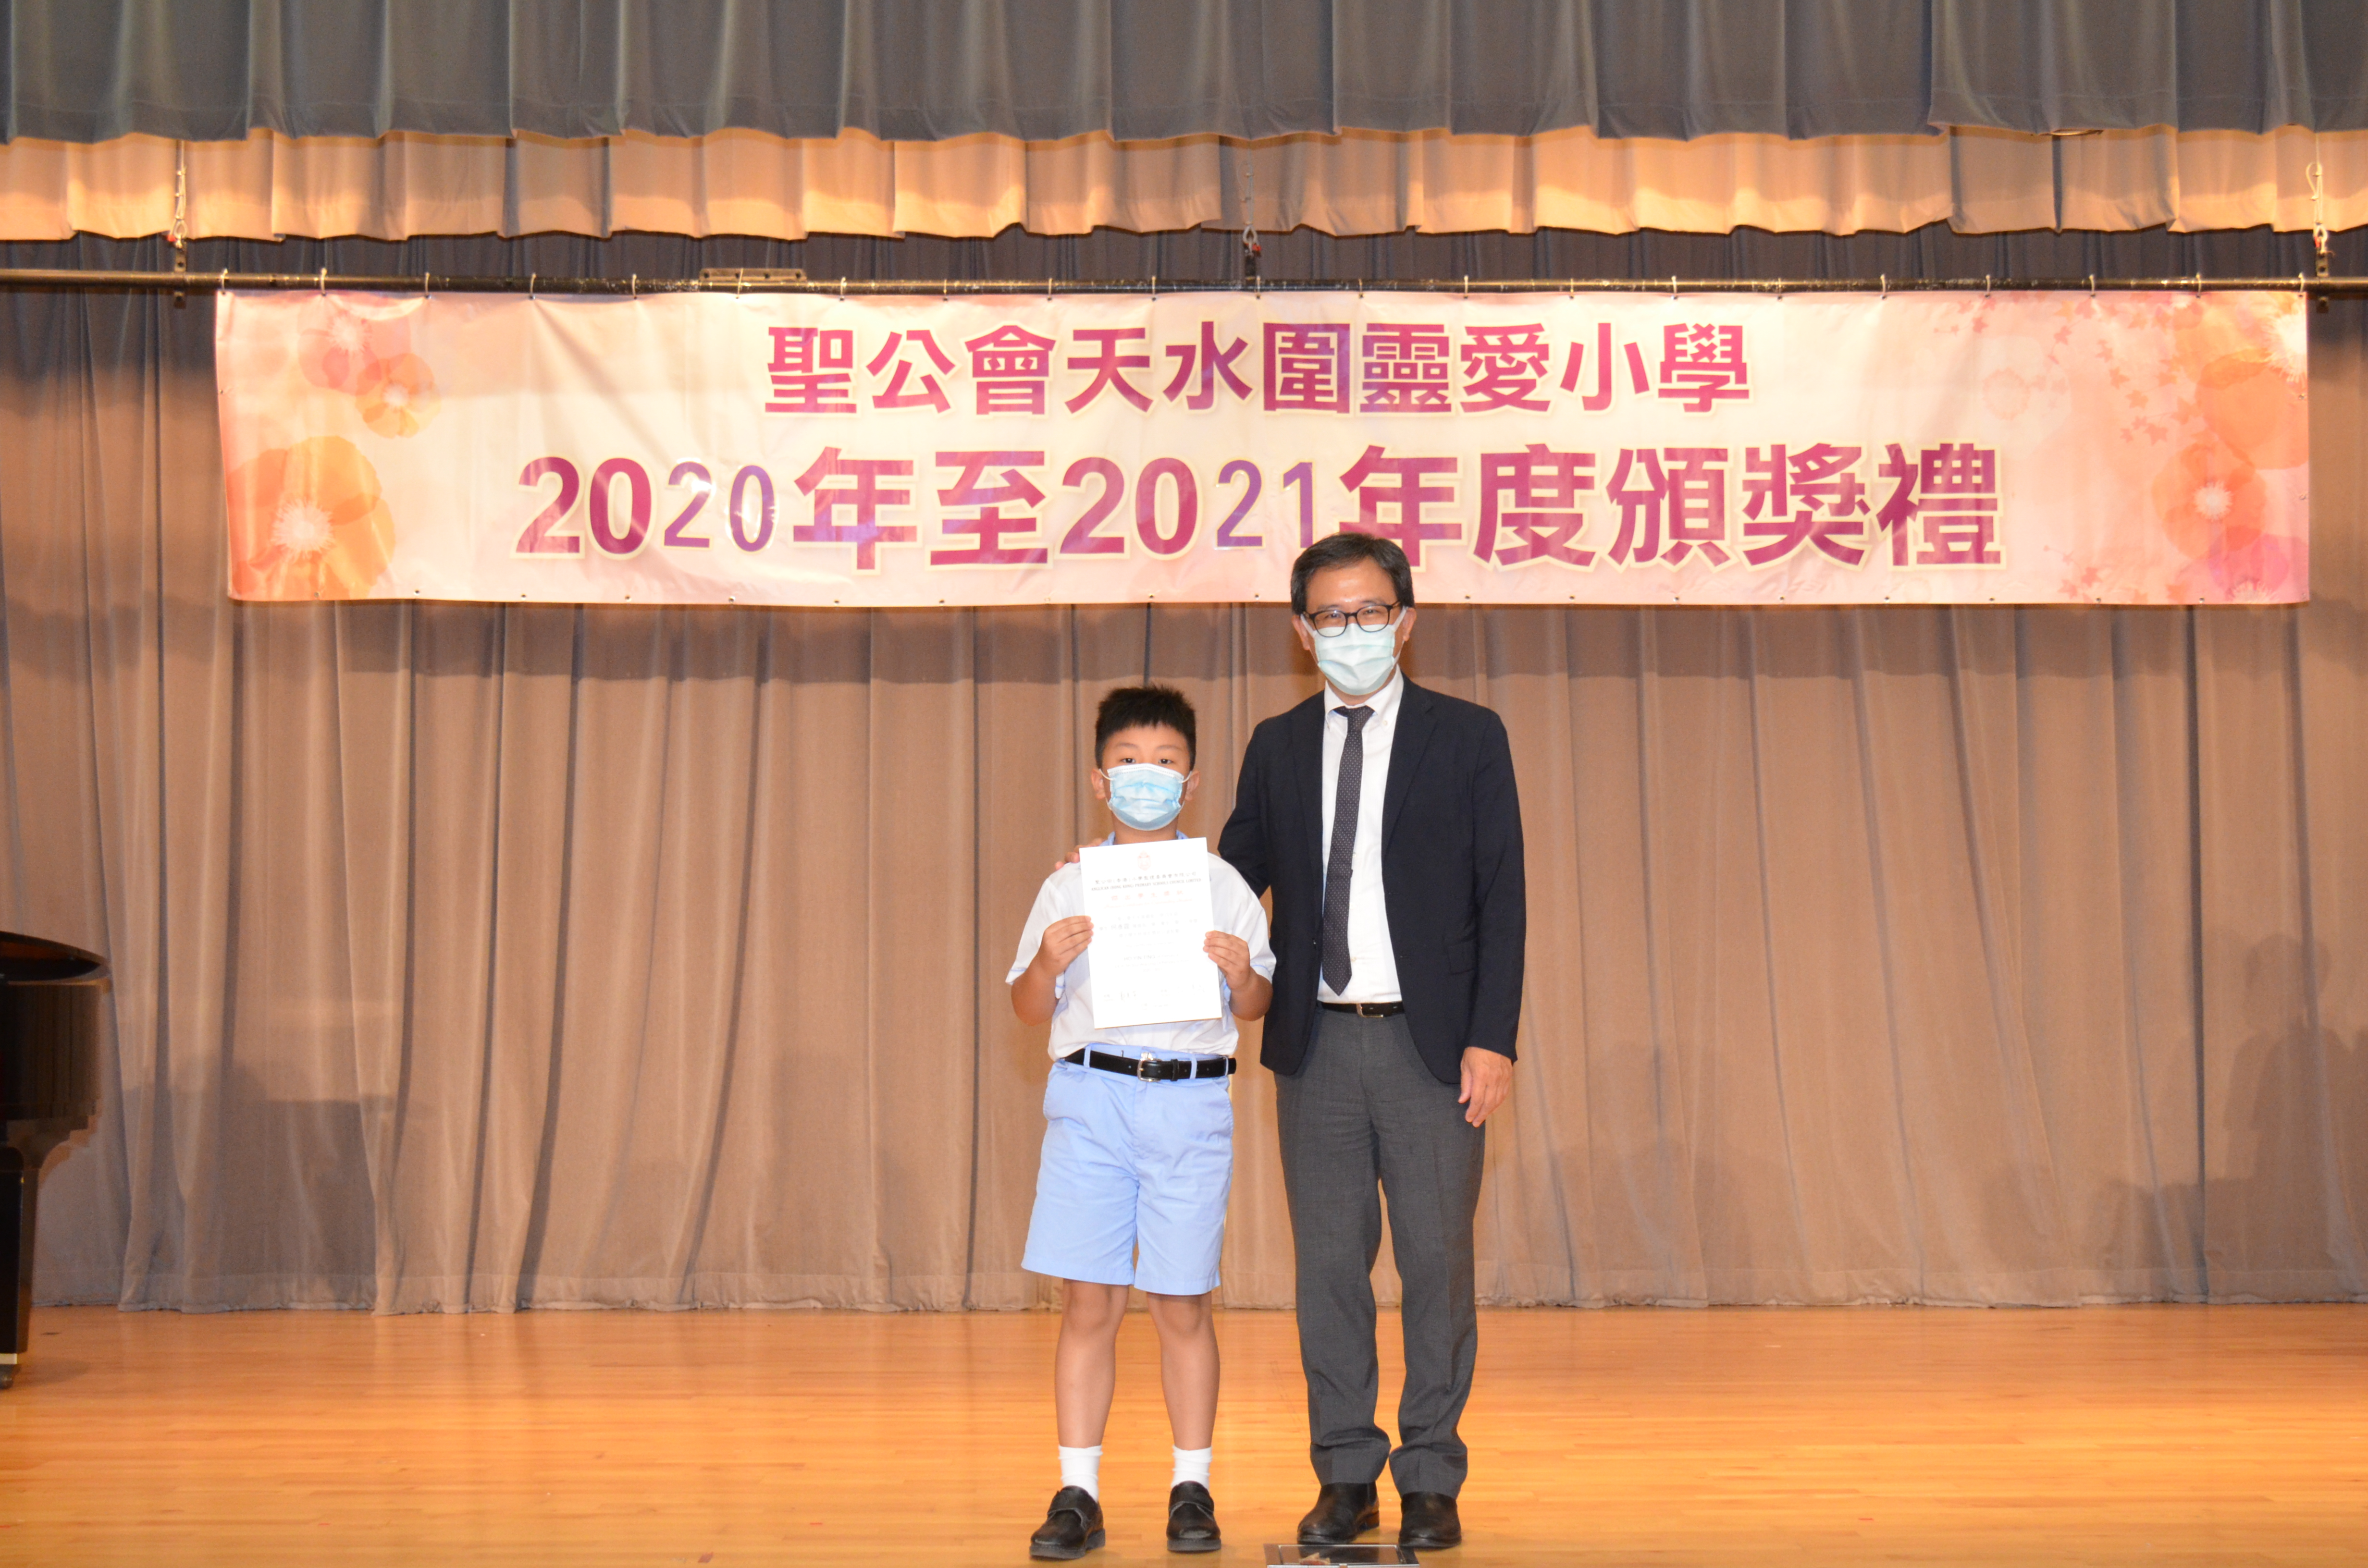 https://skhtswlo.edu.hk/sites/default/files/dsc_3501_1.jpg